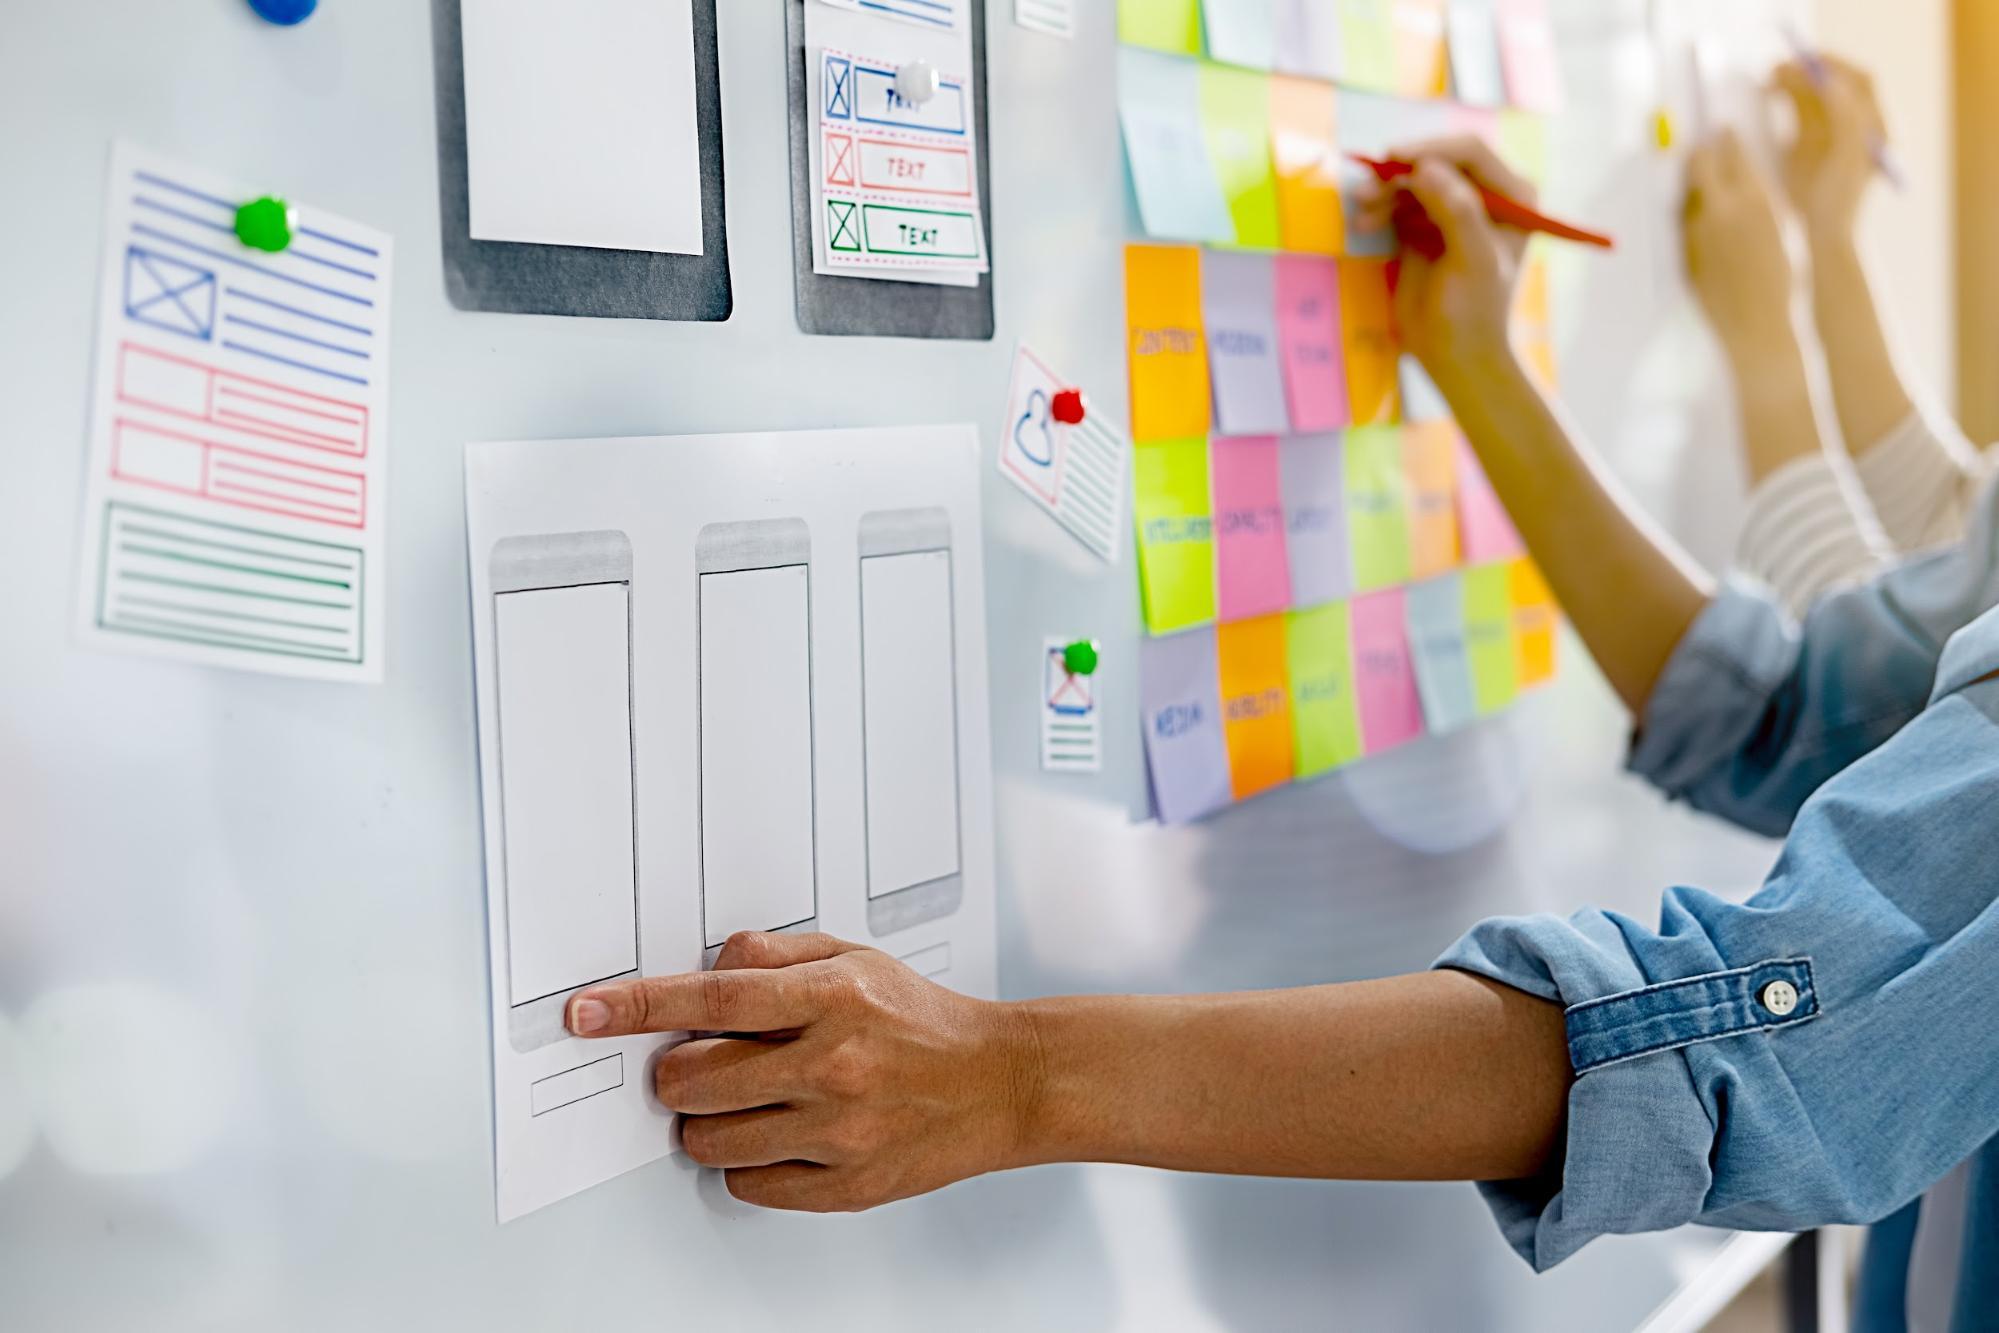 Smartcademy: UX design